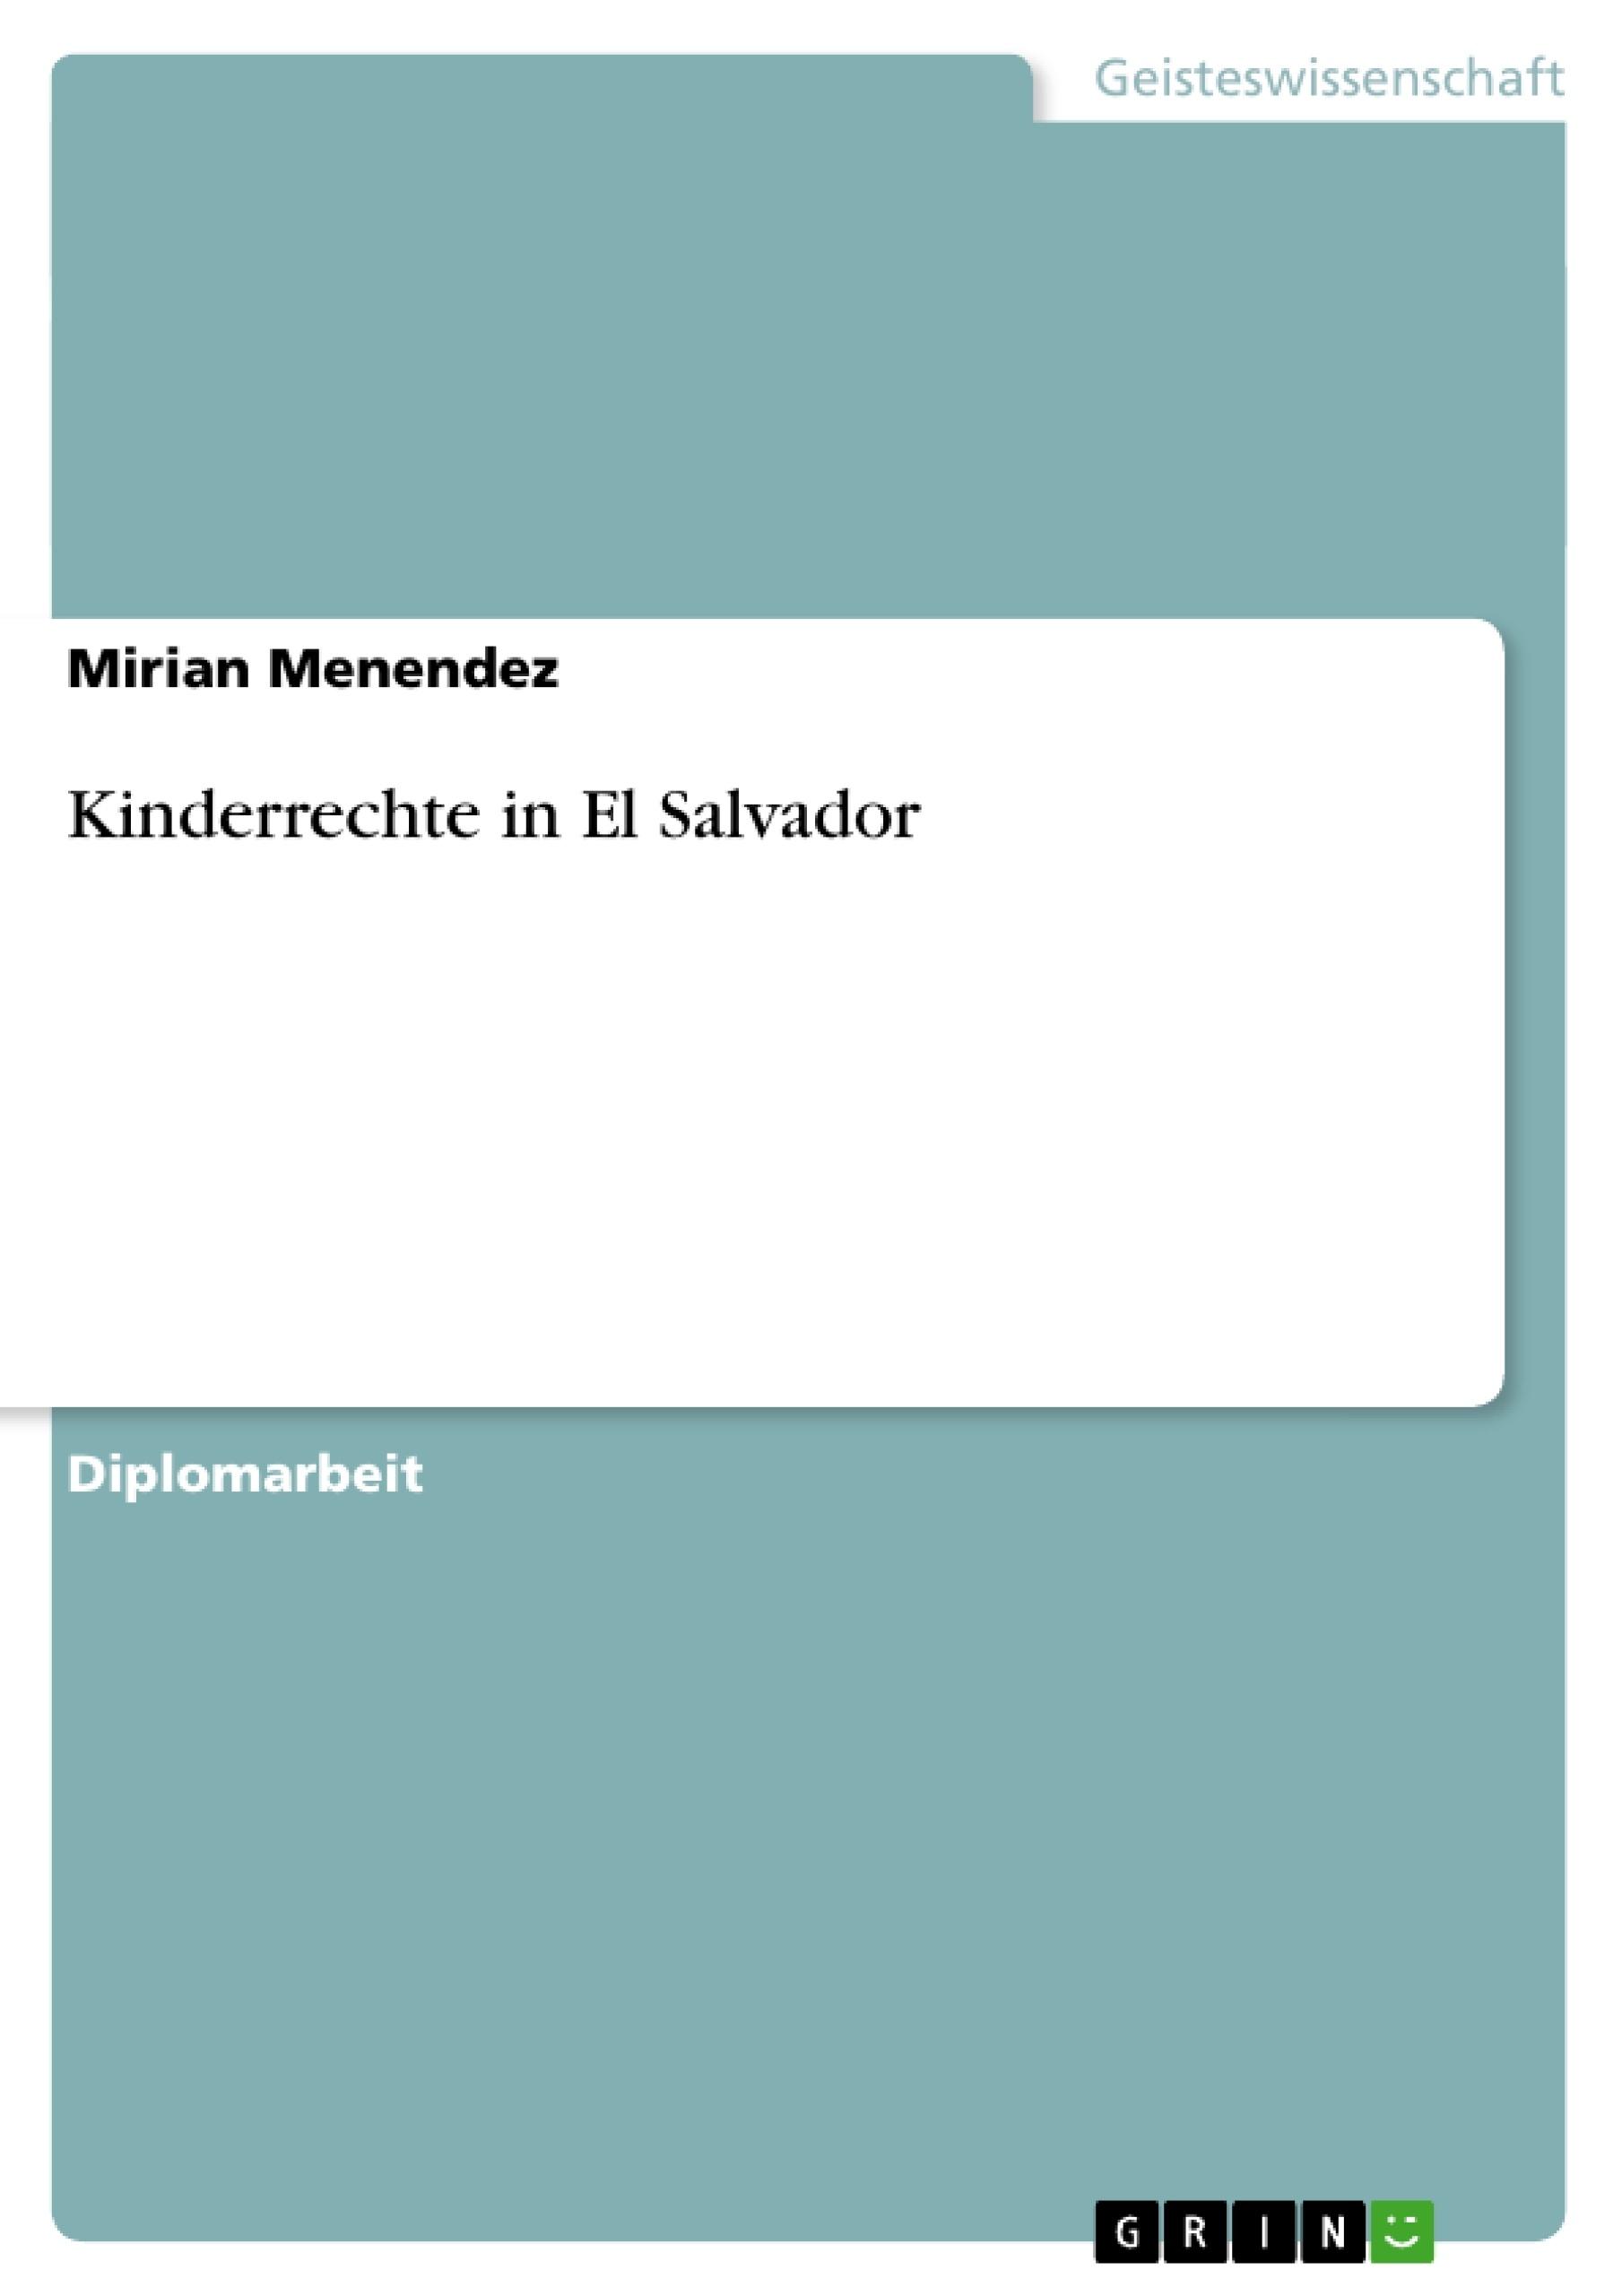 Titel: Kinderrechte in El Salvador